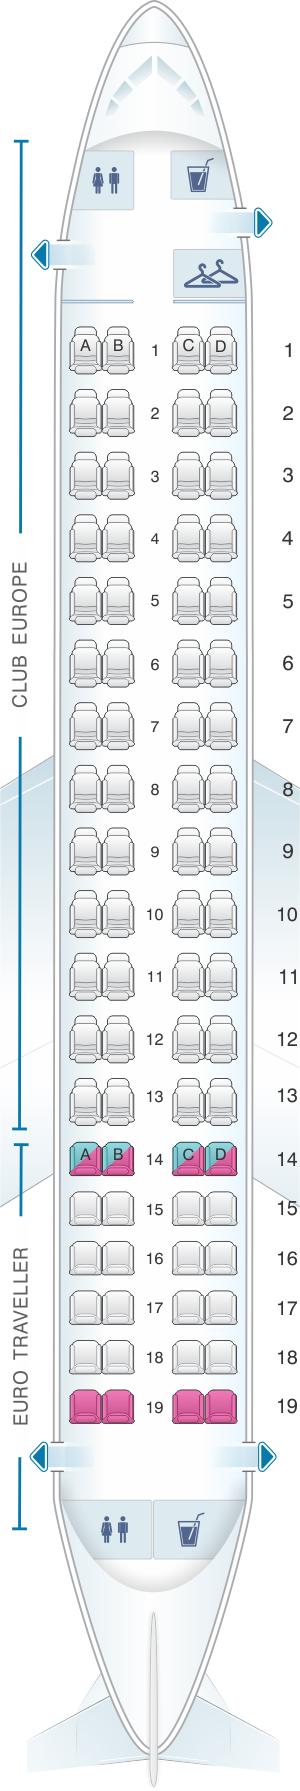 Seat map for British Airways Embraer 170 European